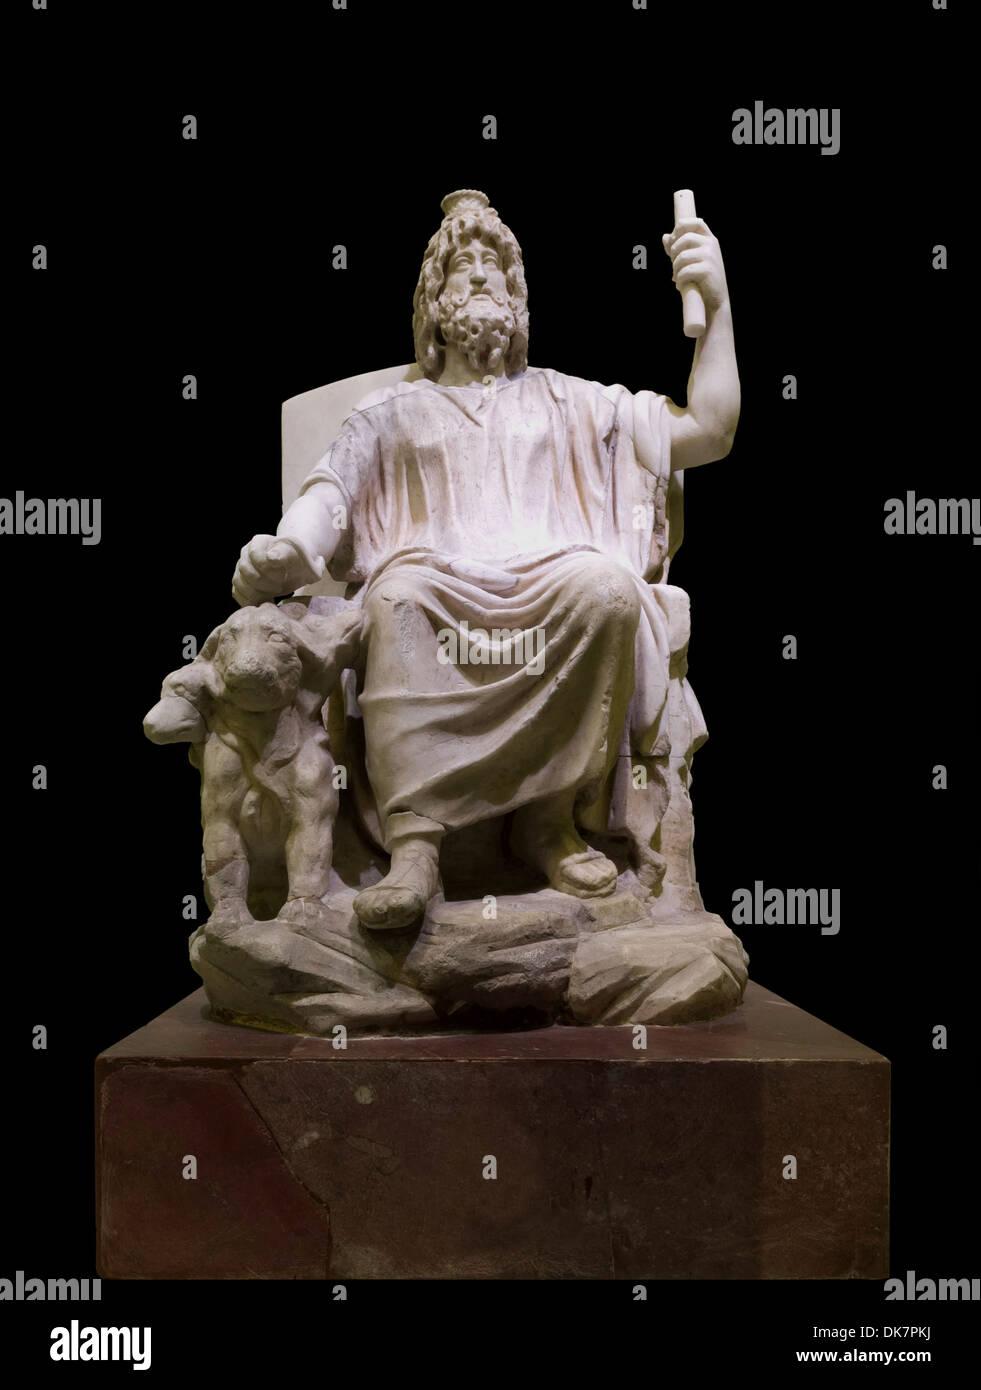 Marble statuette of Serapis, 4th century, Musei Vaticani, temporary exhibition at Colosseum, Rome, Italy. - Stock Image